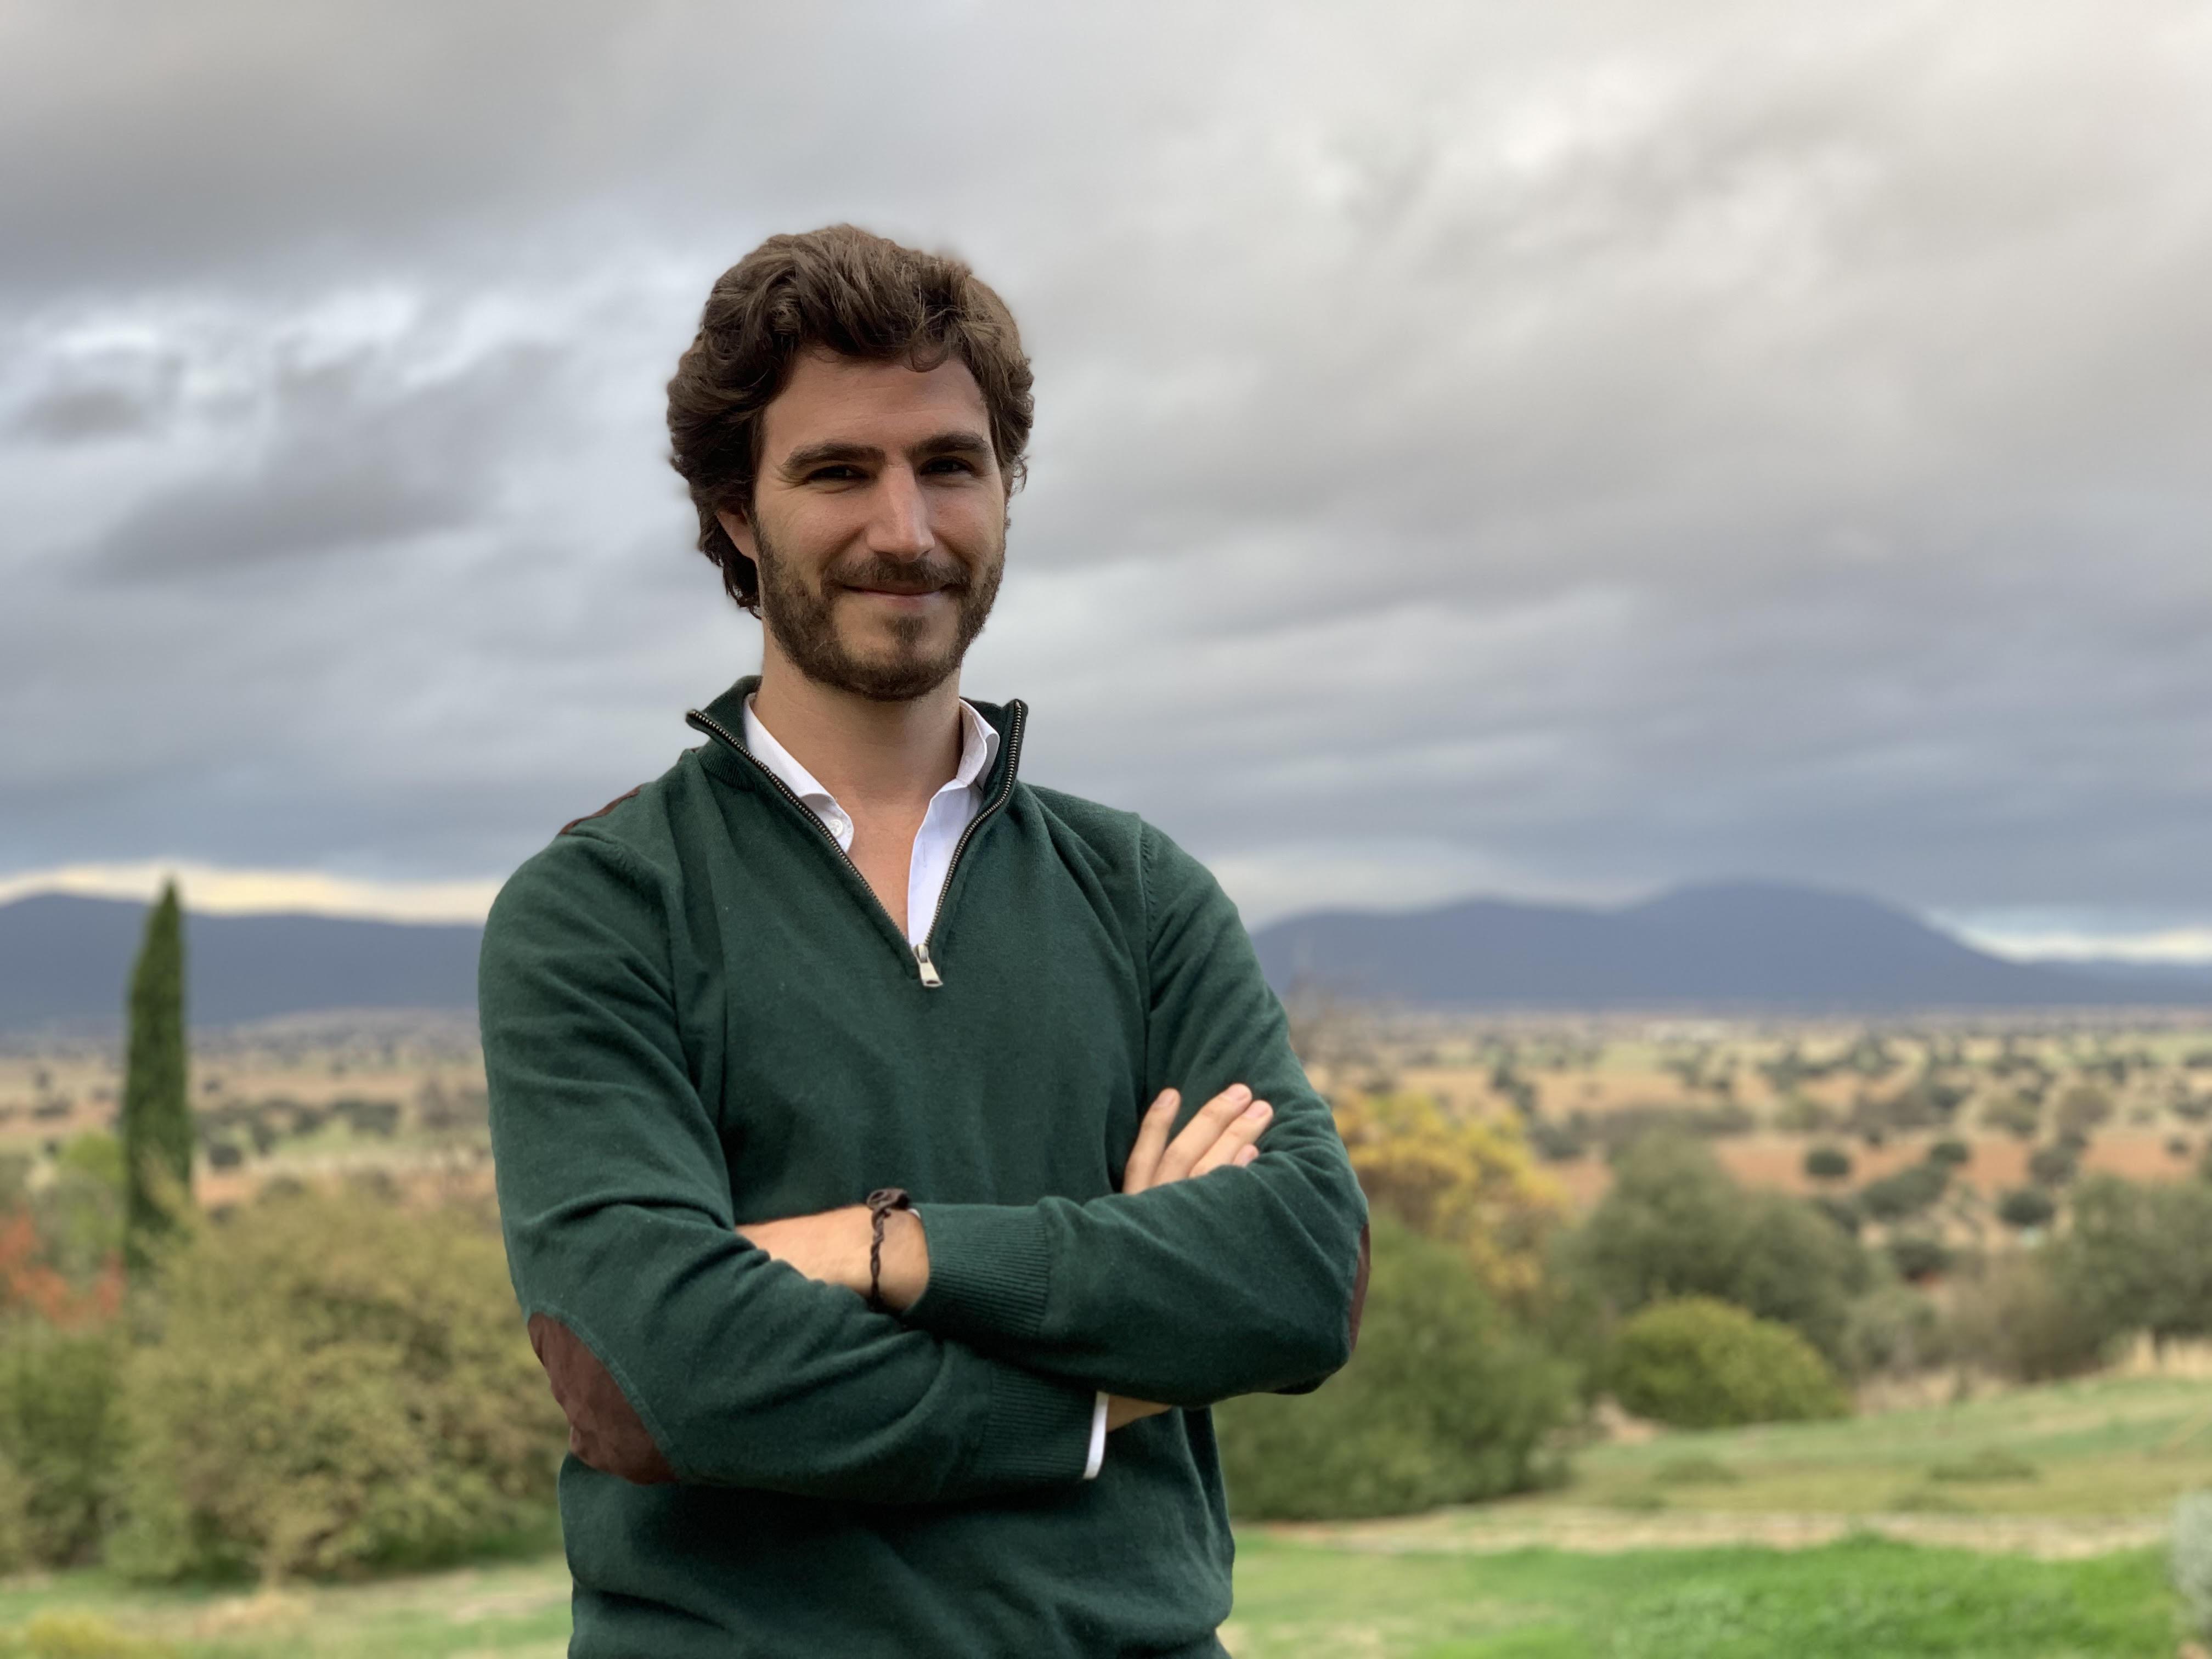 Leopoldo Rodríguez-Jurado, el técnico agrícola detrás de Orion Agriculture